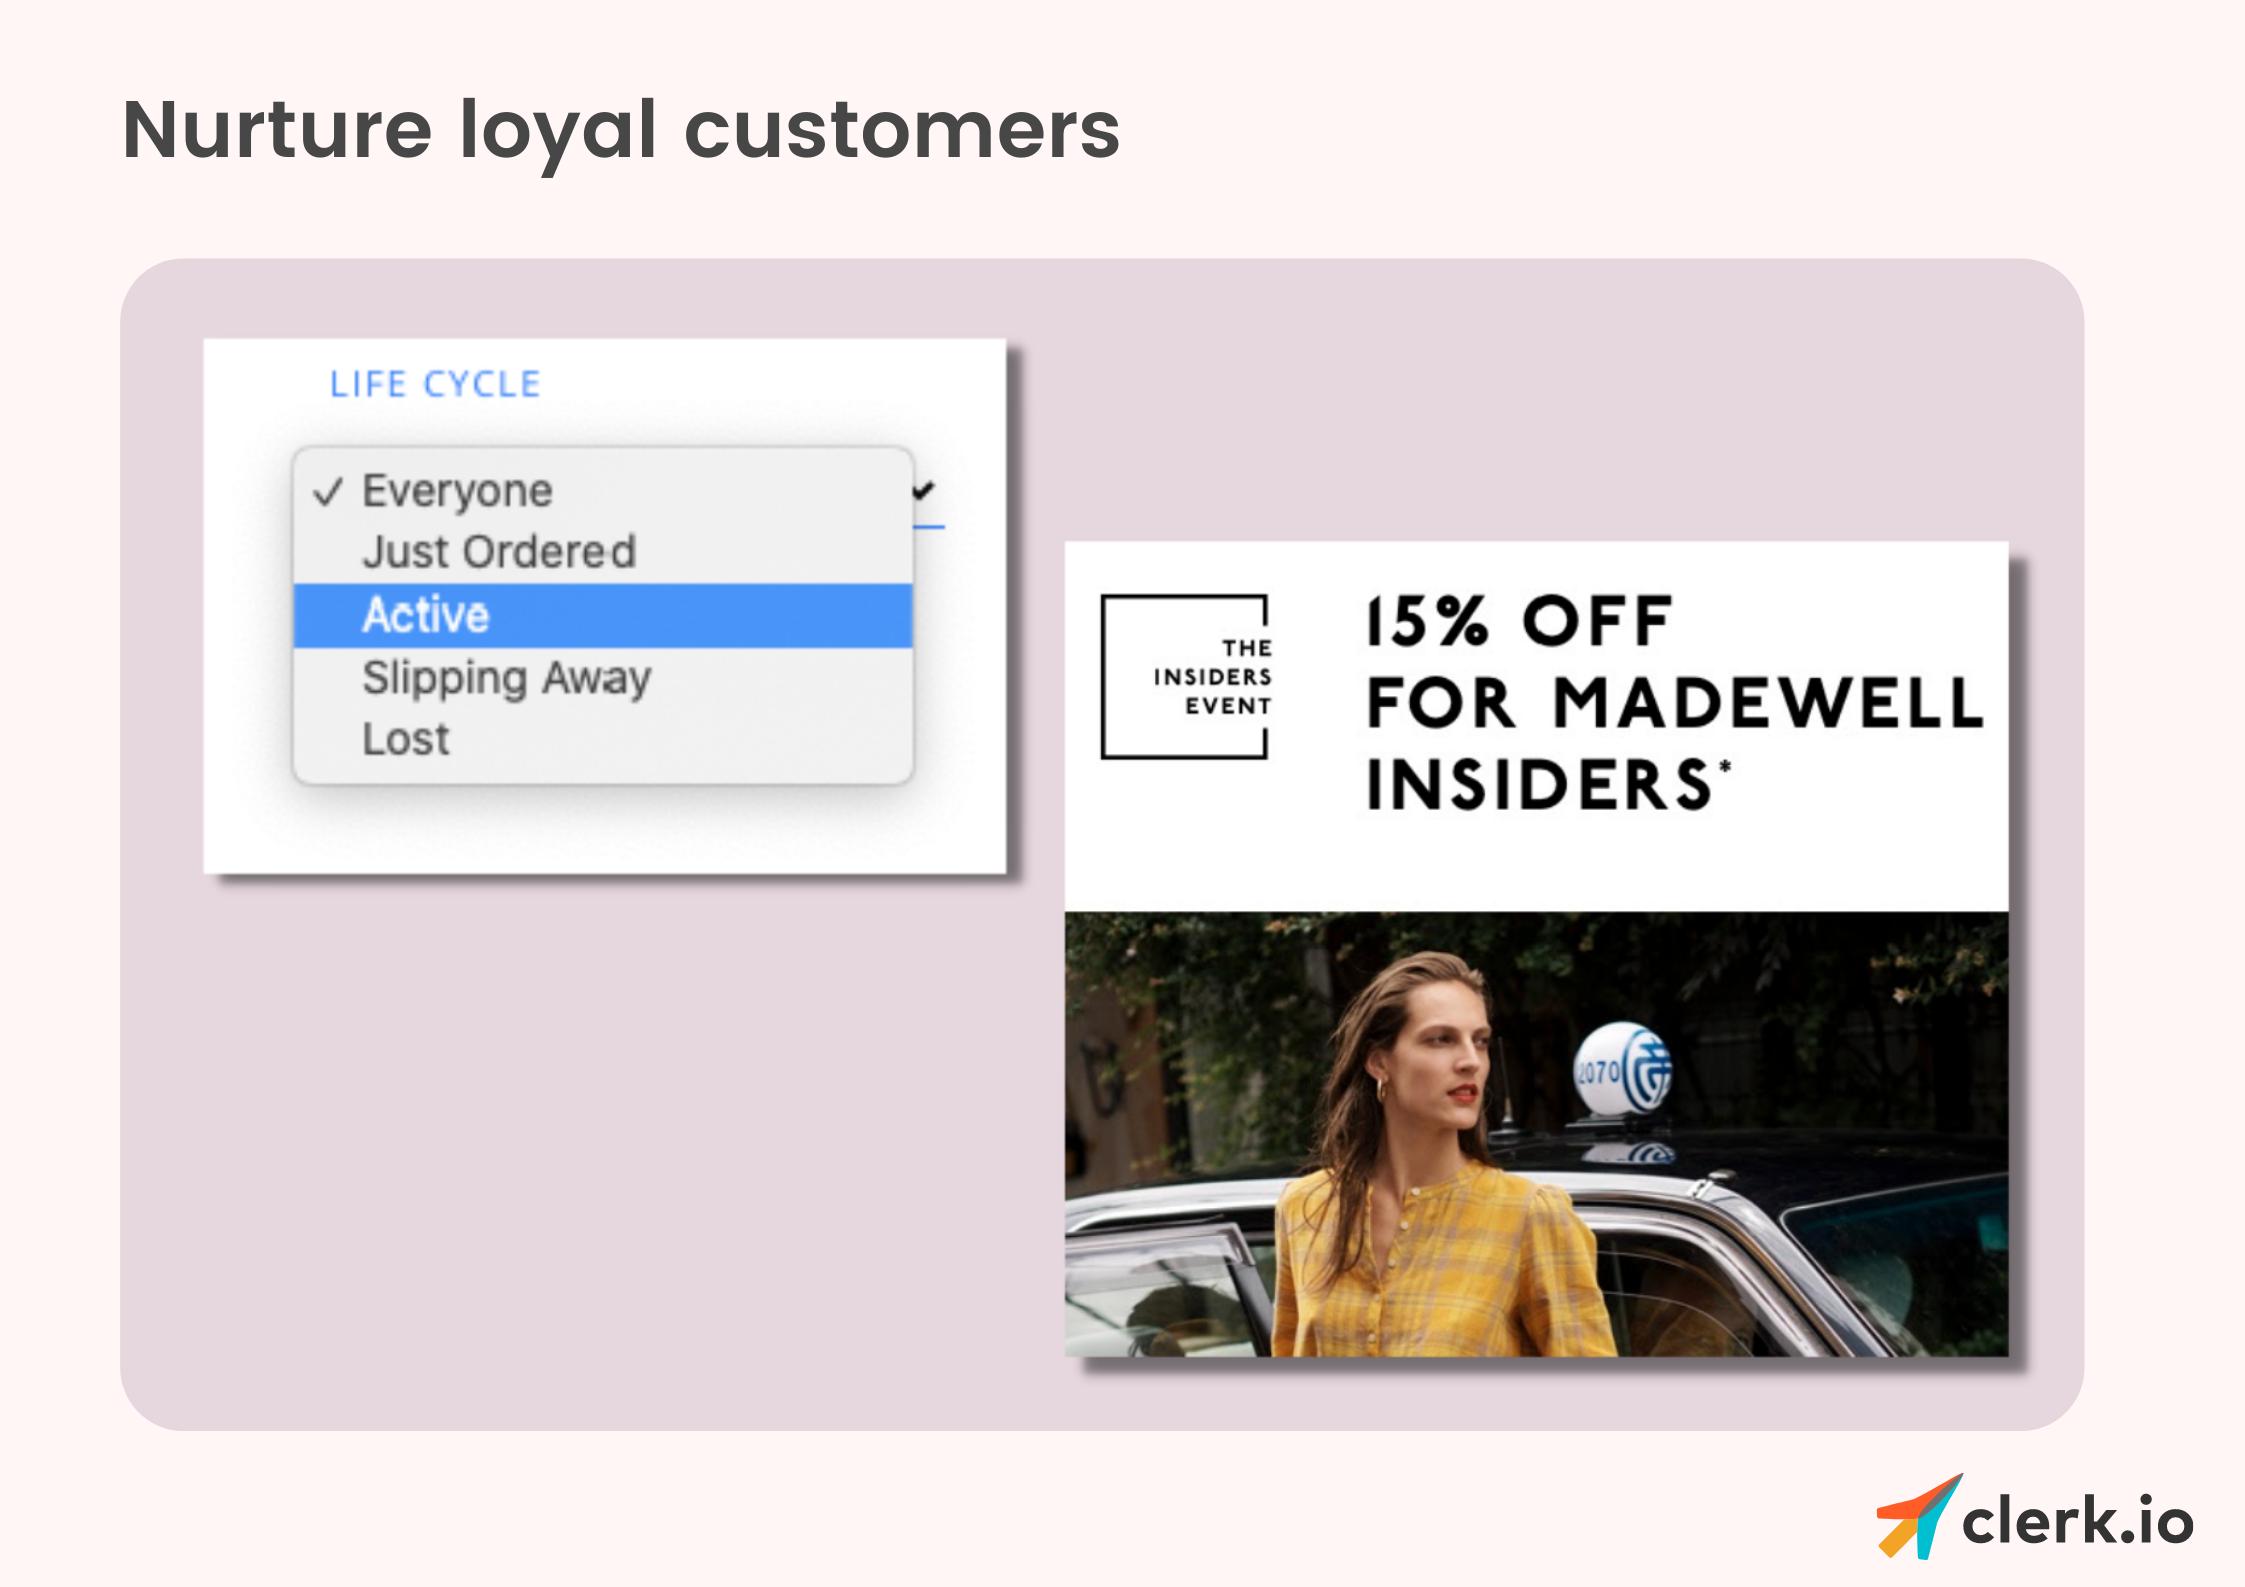 How to nurture loyal customers